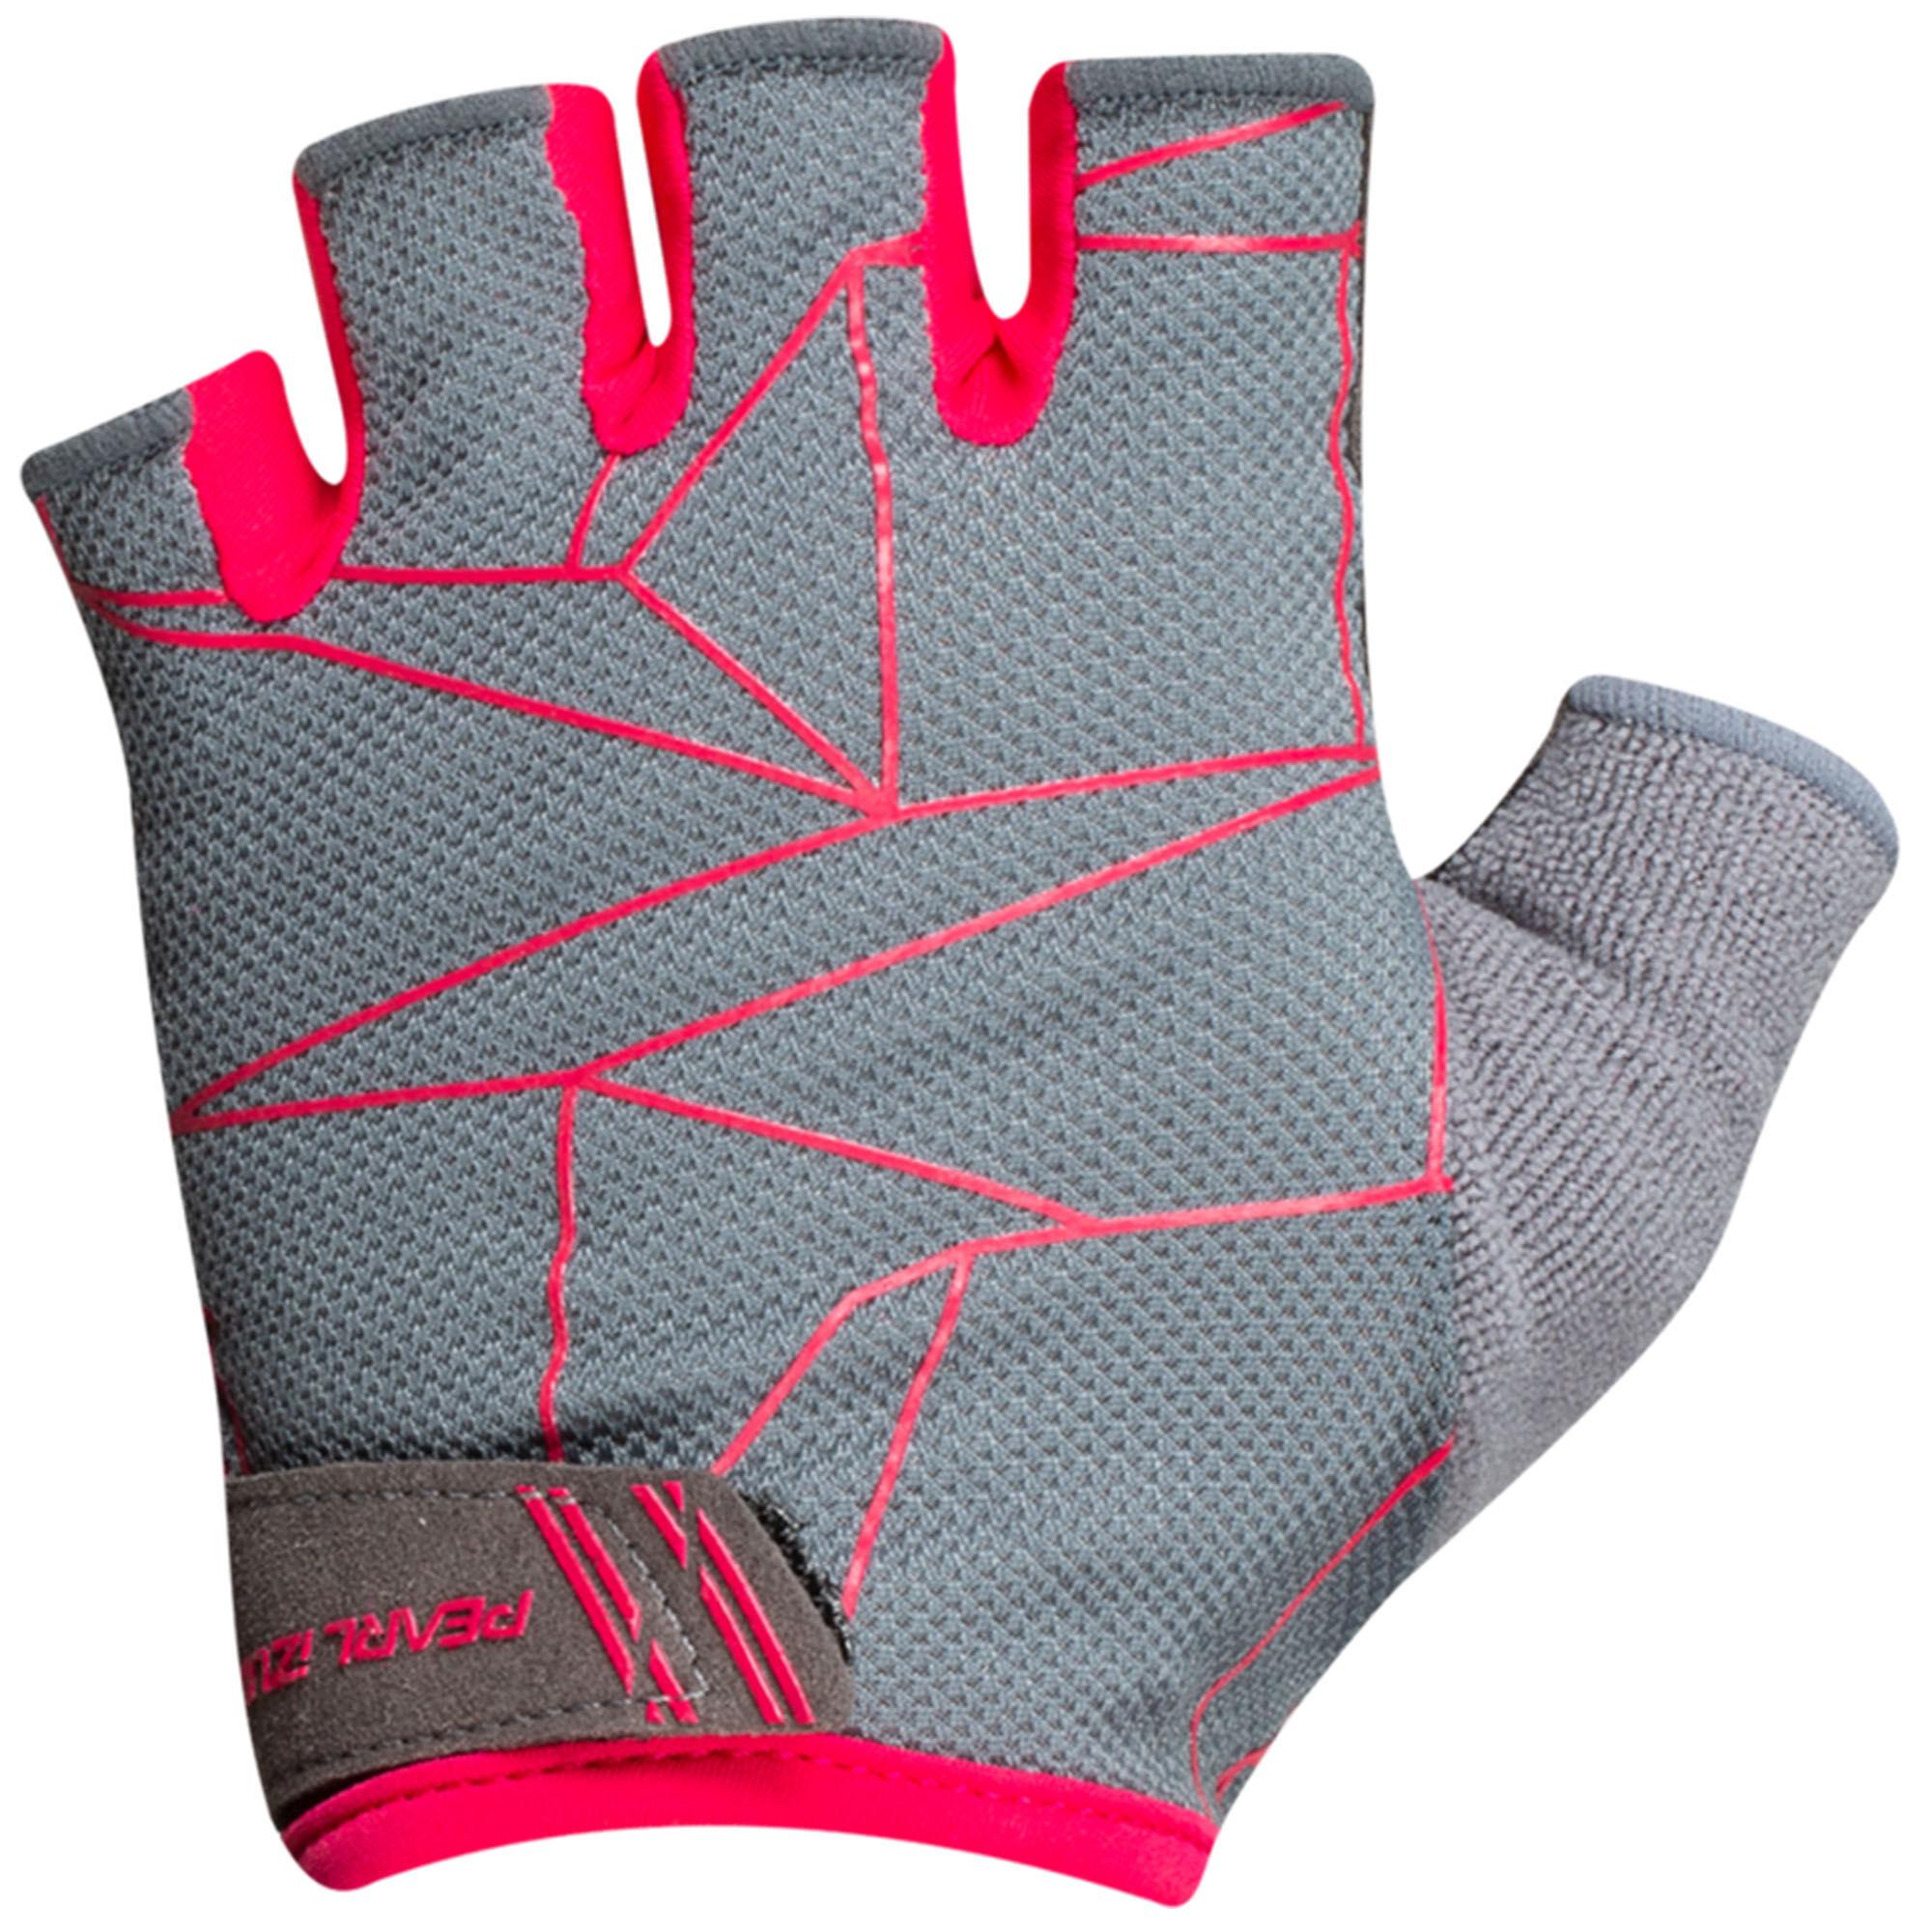 Pearl Izumi Women's Select Bike Gloves  - Black - Size: Extra Large